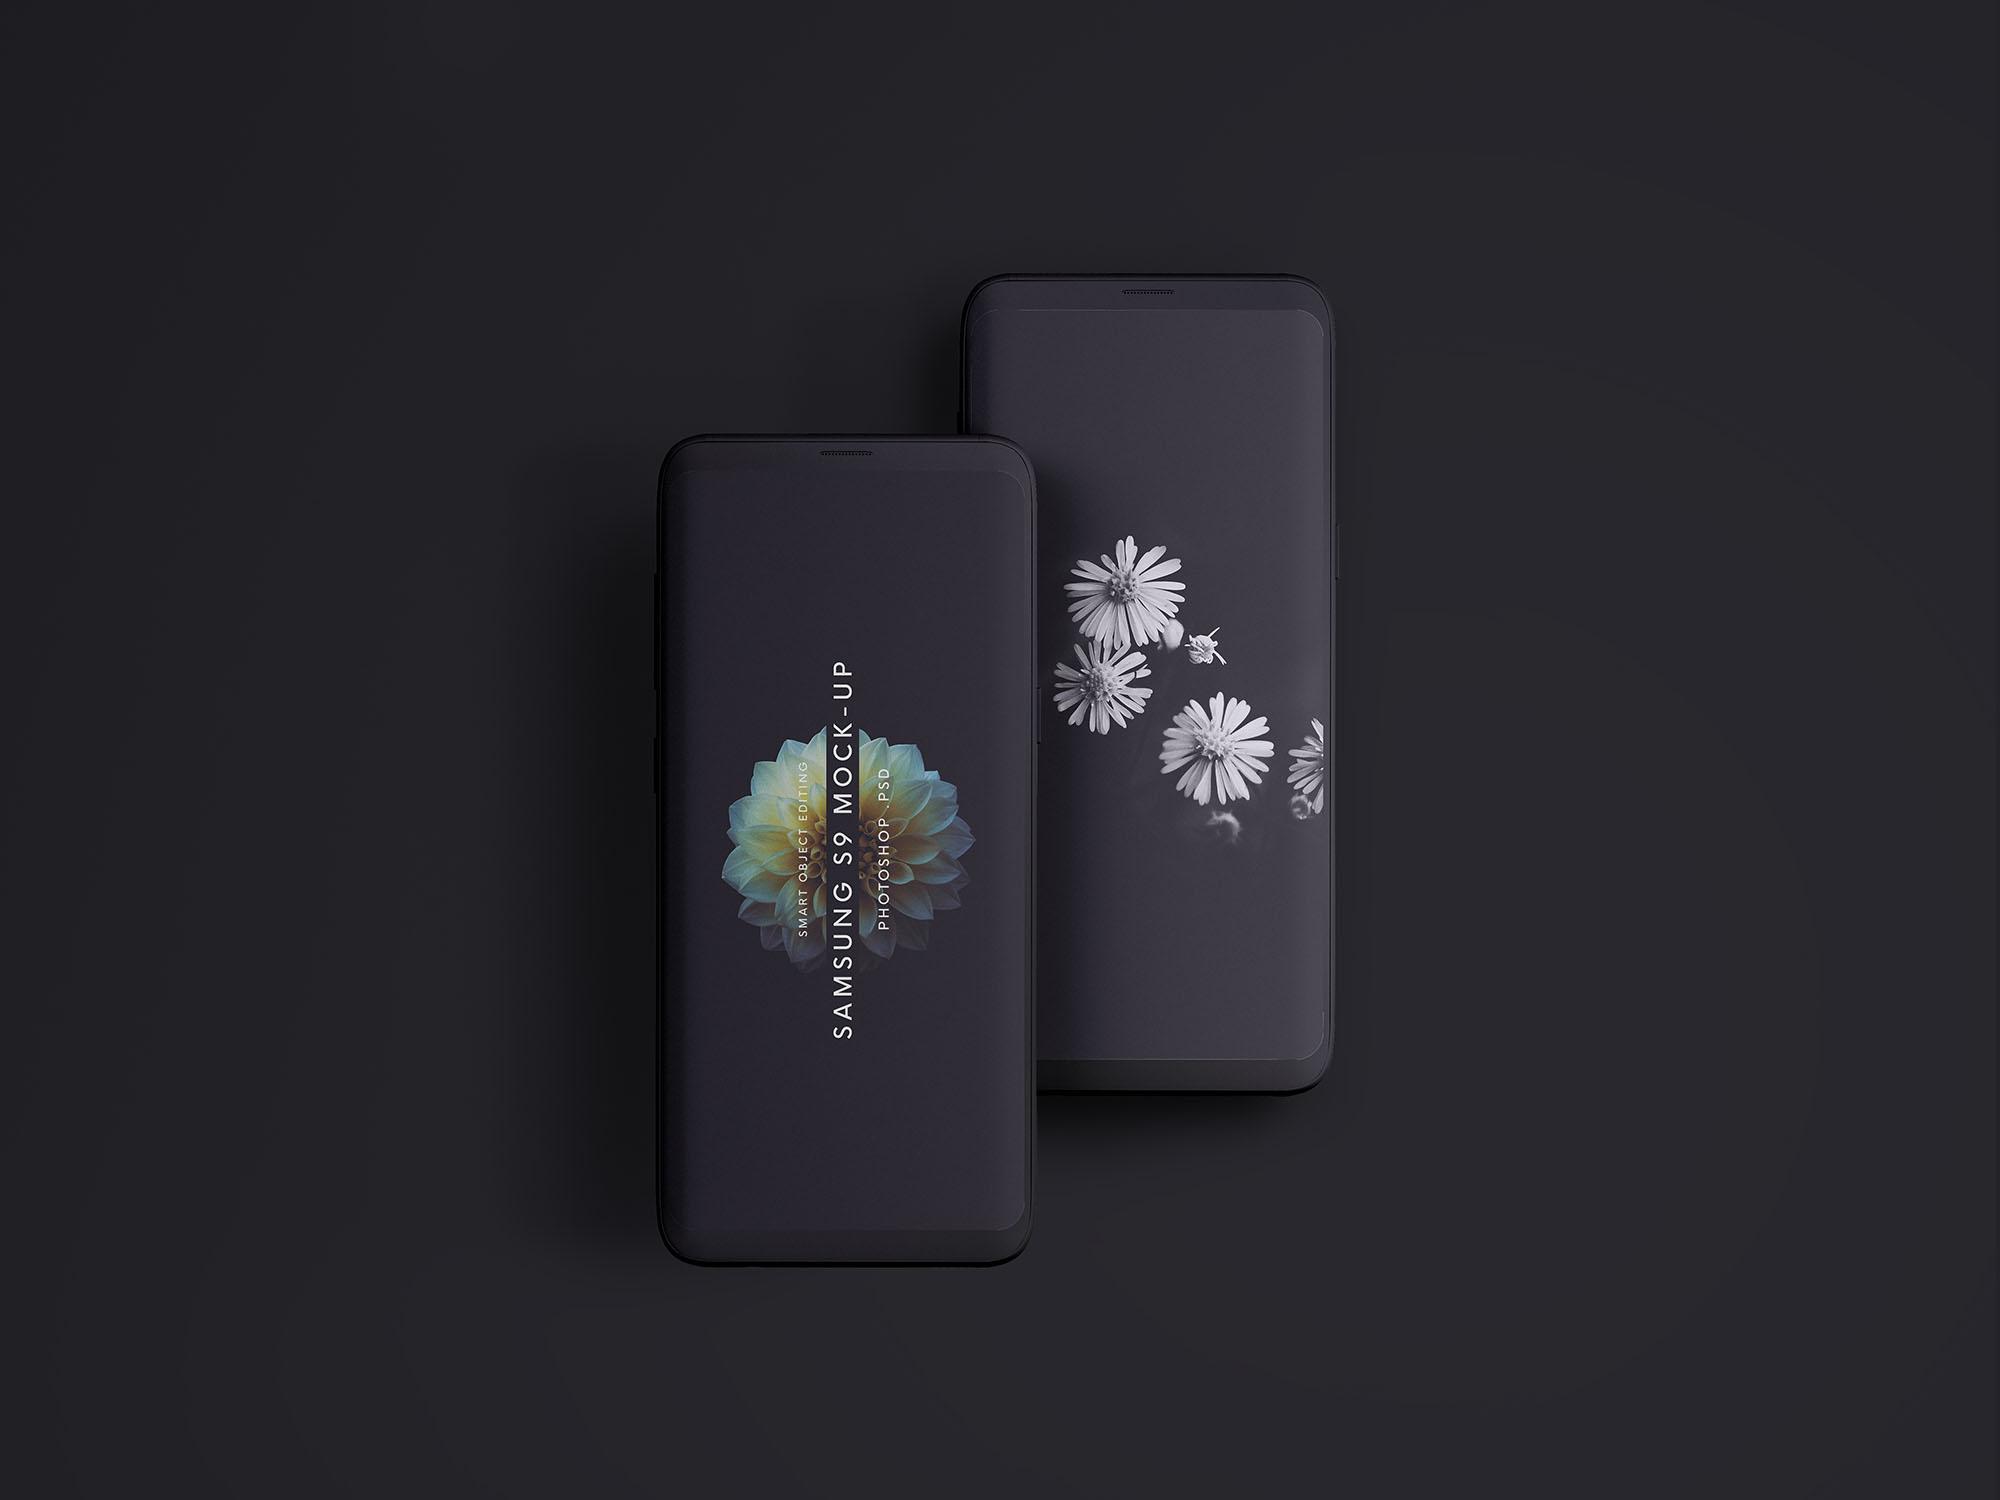 Free Samsung Galaxy S9 Phone Mockup